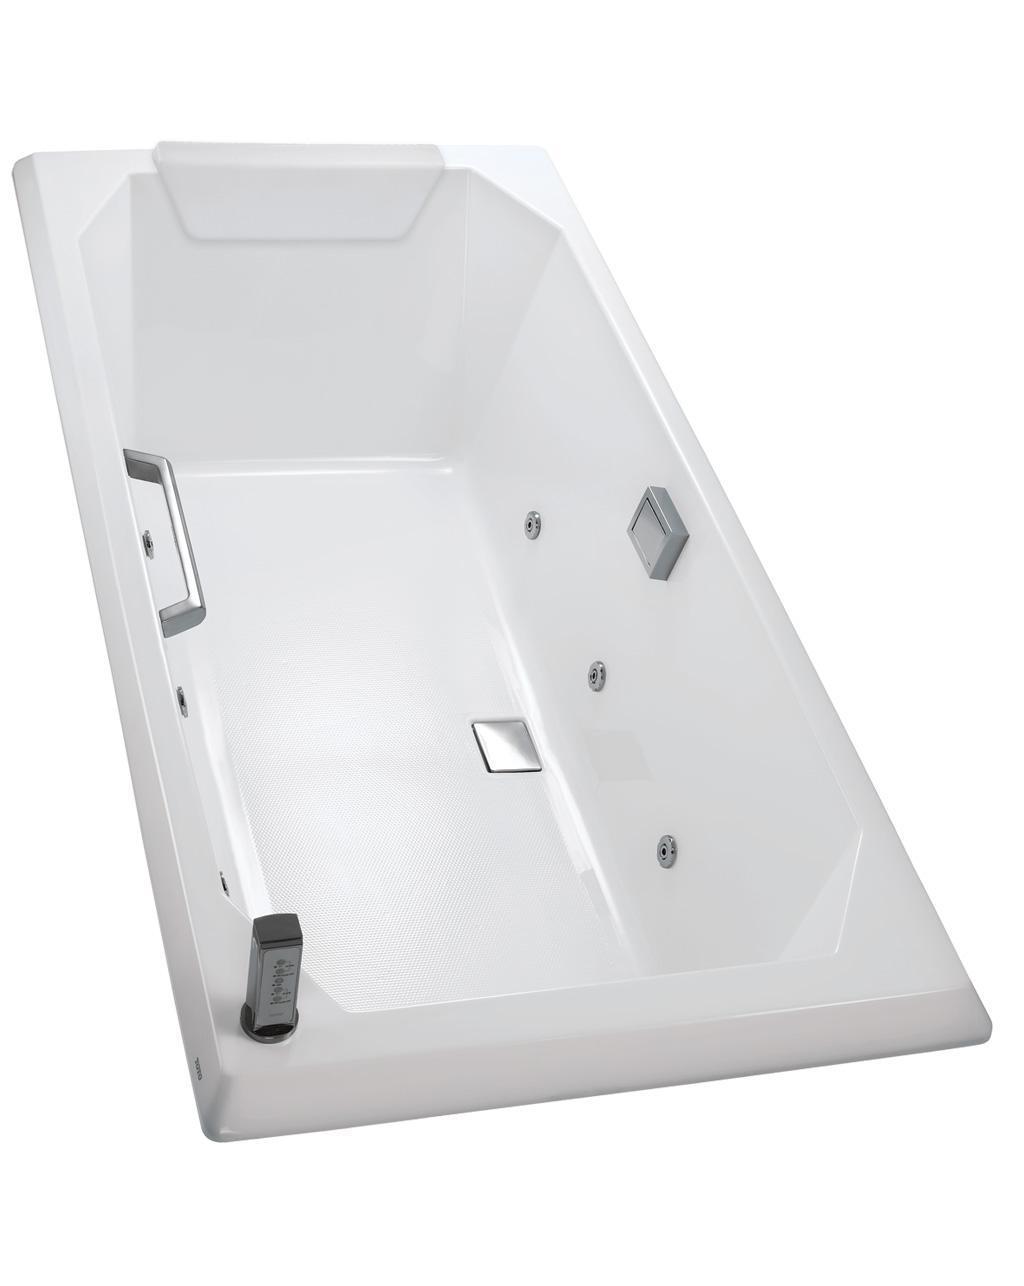 TOTO亚克力浴缸PAYD1810HPWPAYD1810HPW